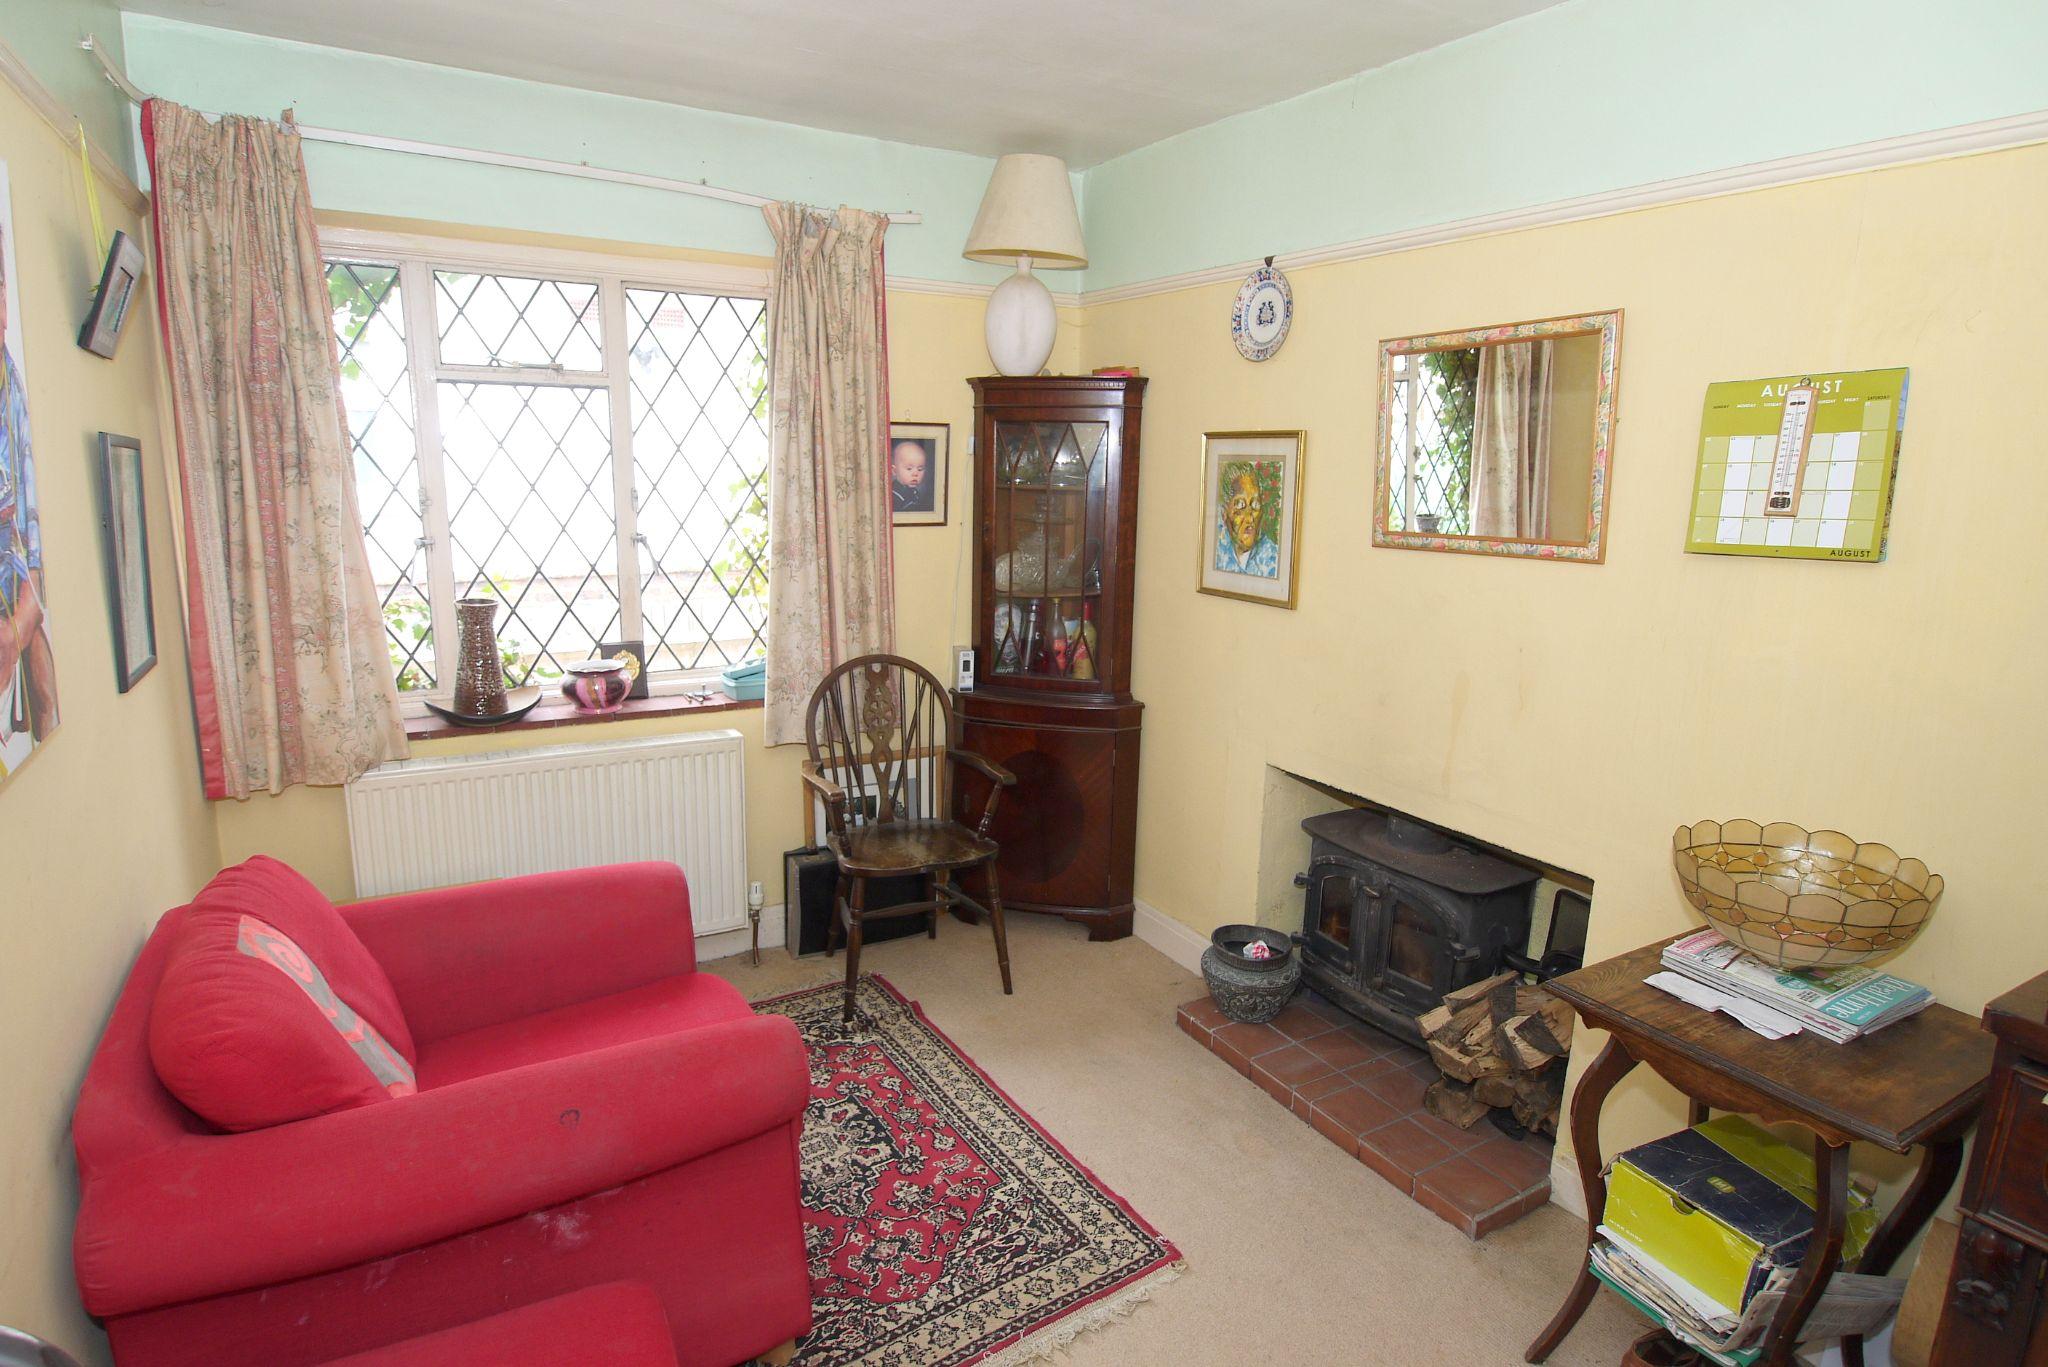 4 bedroom detached bungalow Sold in Sevenoaks - Photograph 3